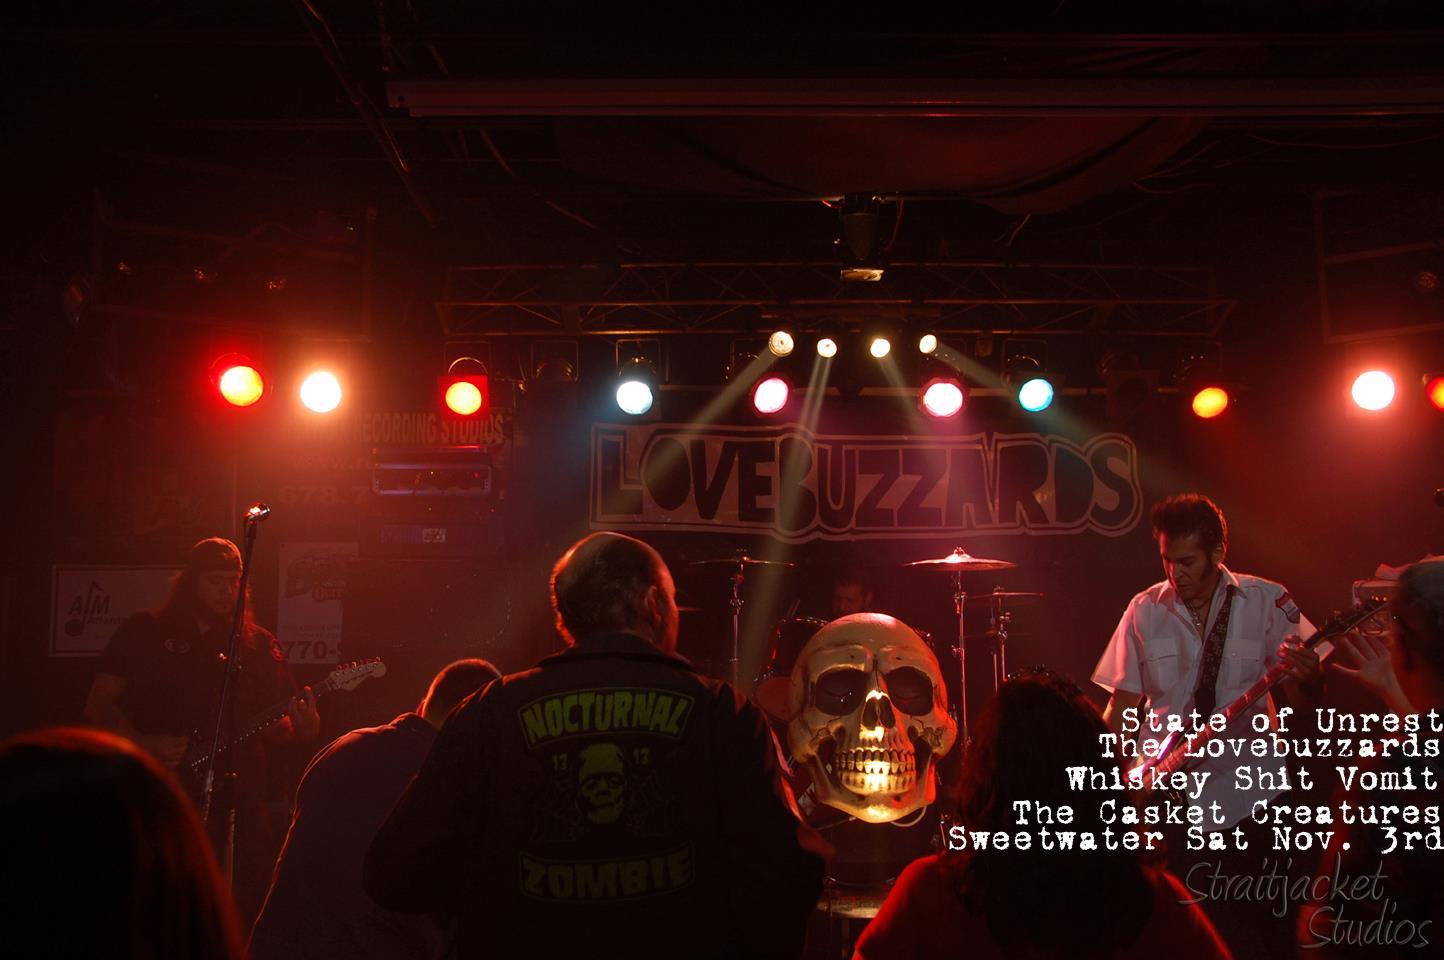 the lovebuzzards